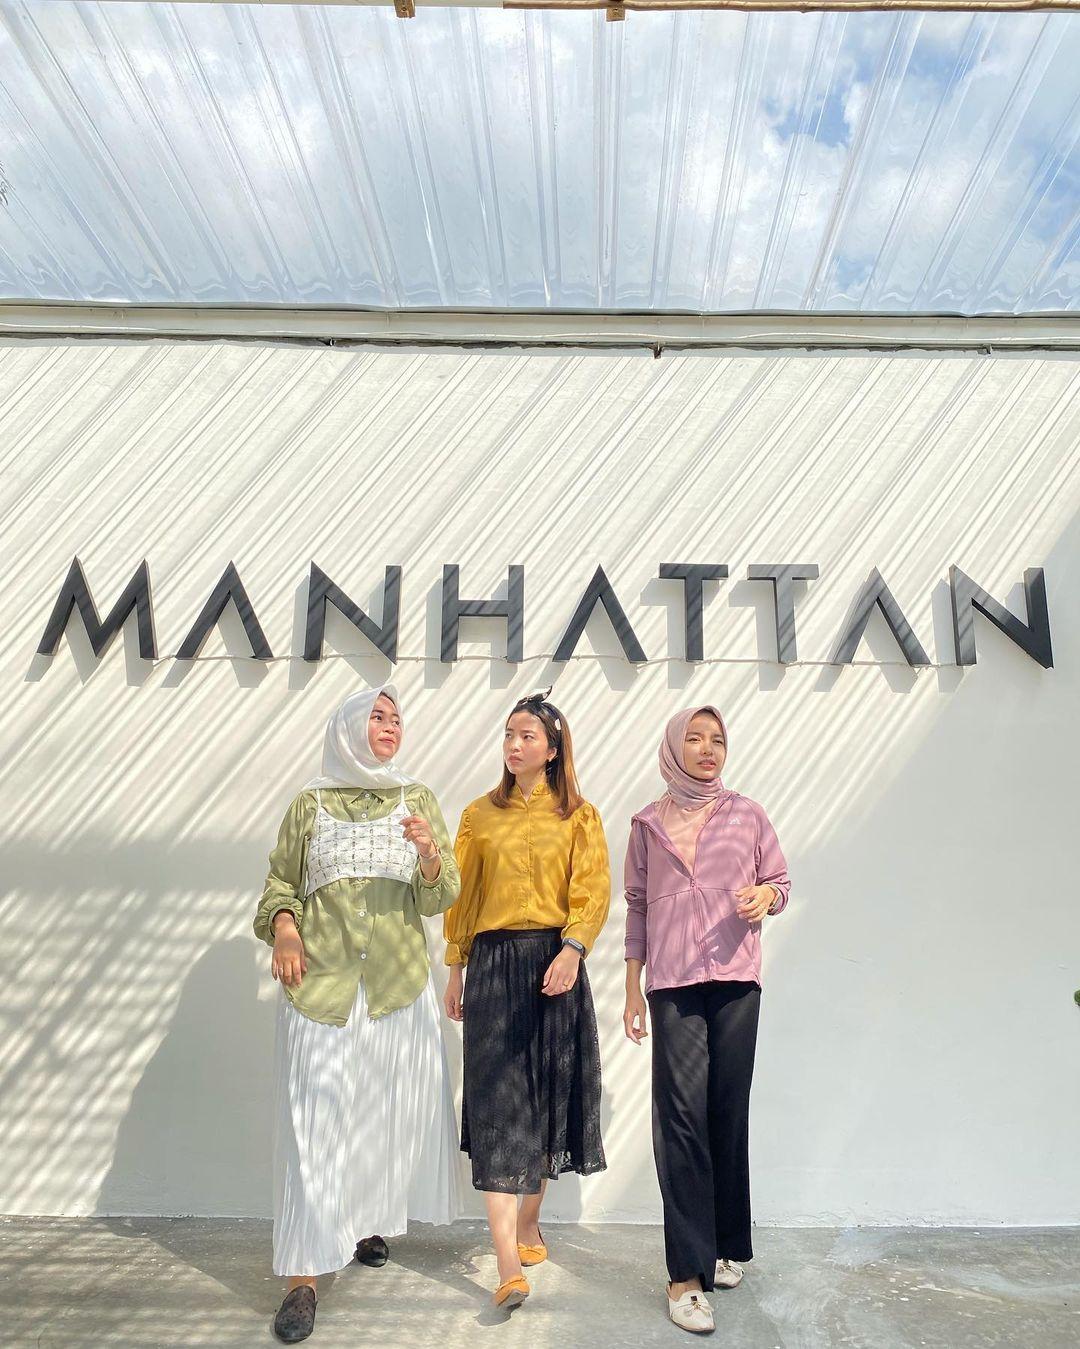 Berfoto Di Tulisan Manhattan Cafe Image From @annaline98